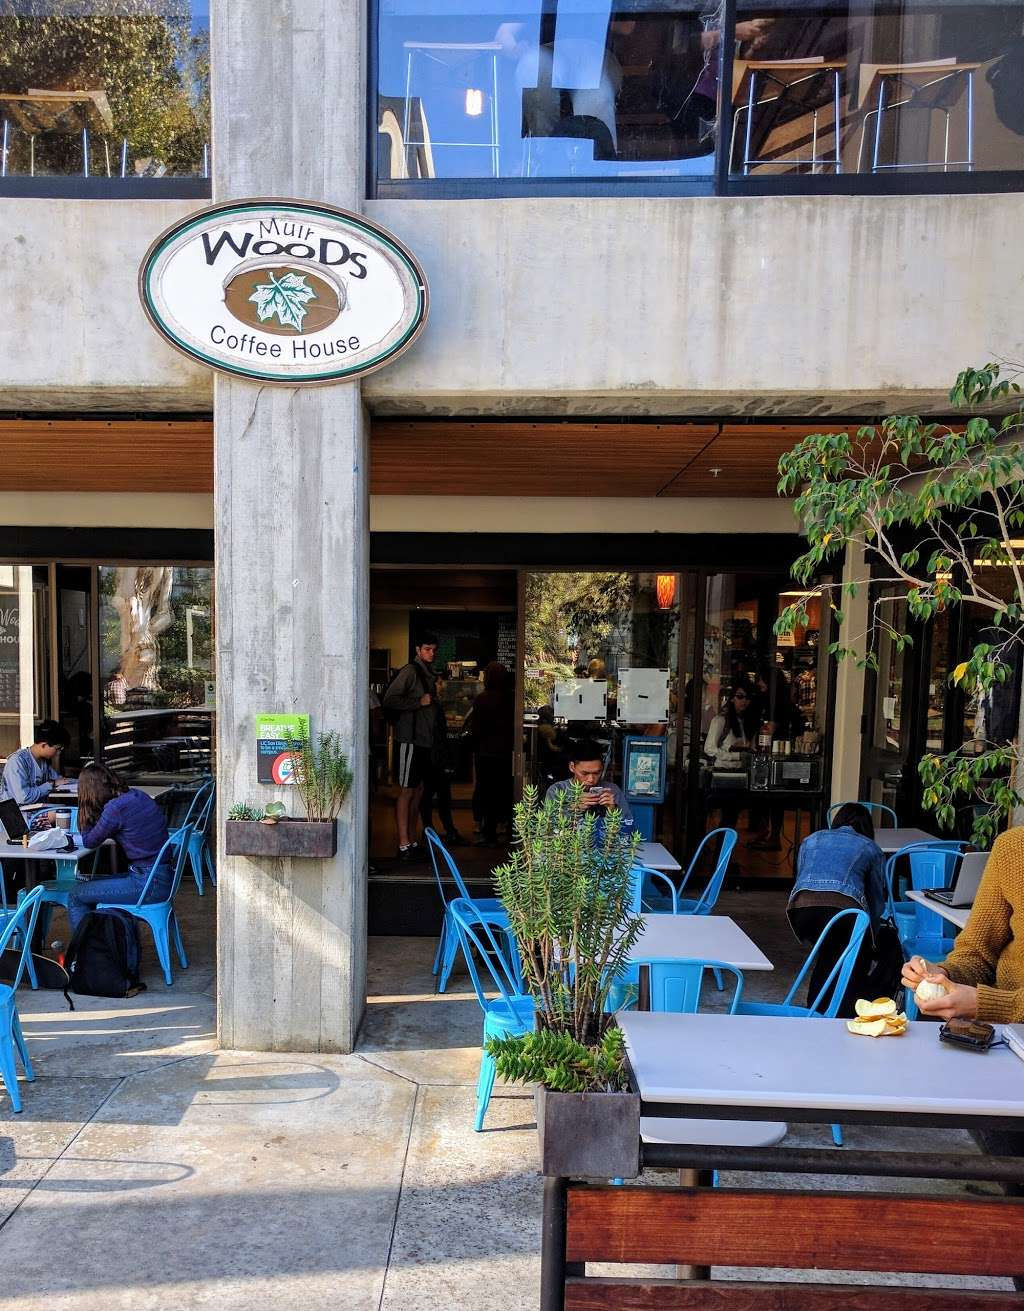 Muir Woods Coffee House - cafe  | Photo 3 of 10 | Address: 9500 Gilman Dr, La Jolla, CA 92093, USA